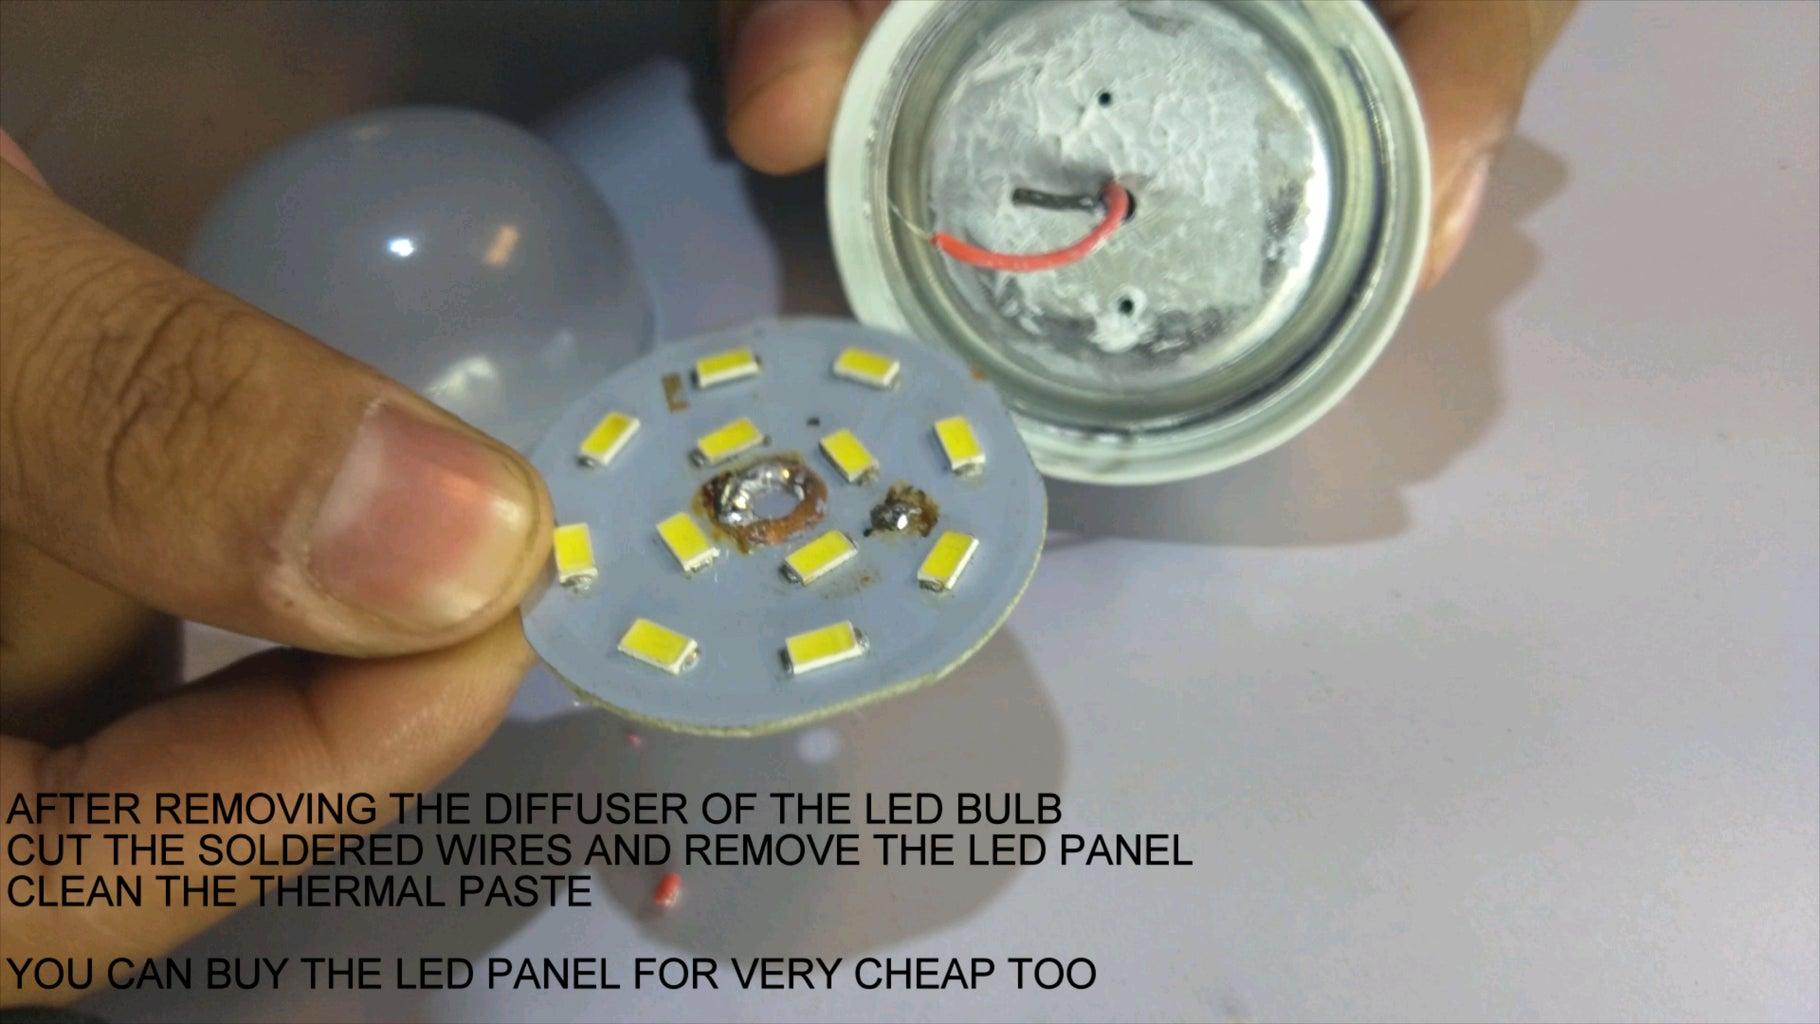 PREPARING THE LEDS